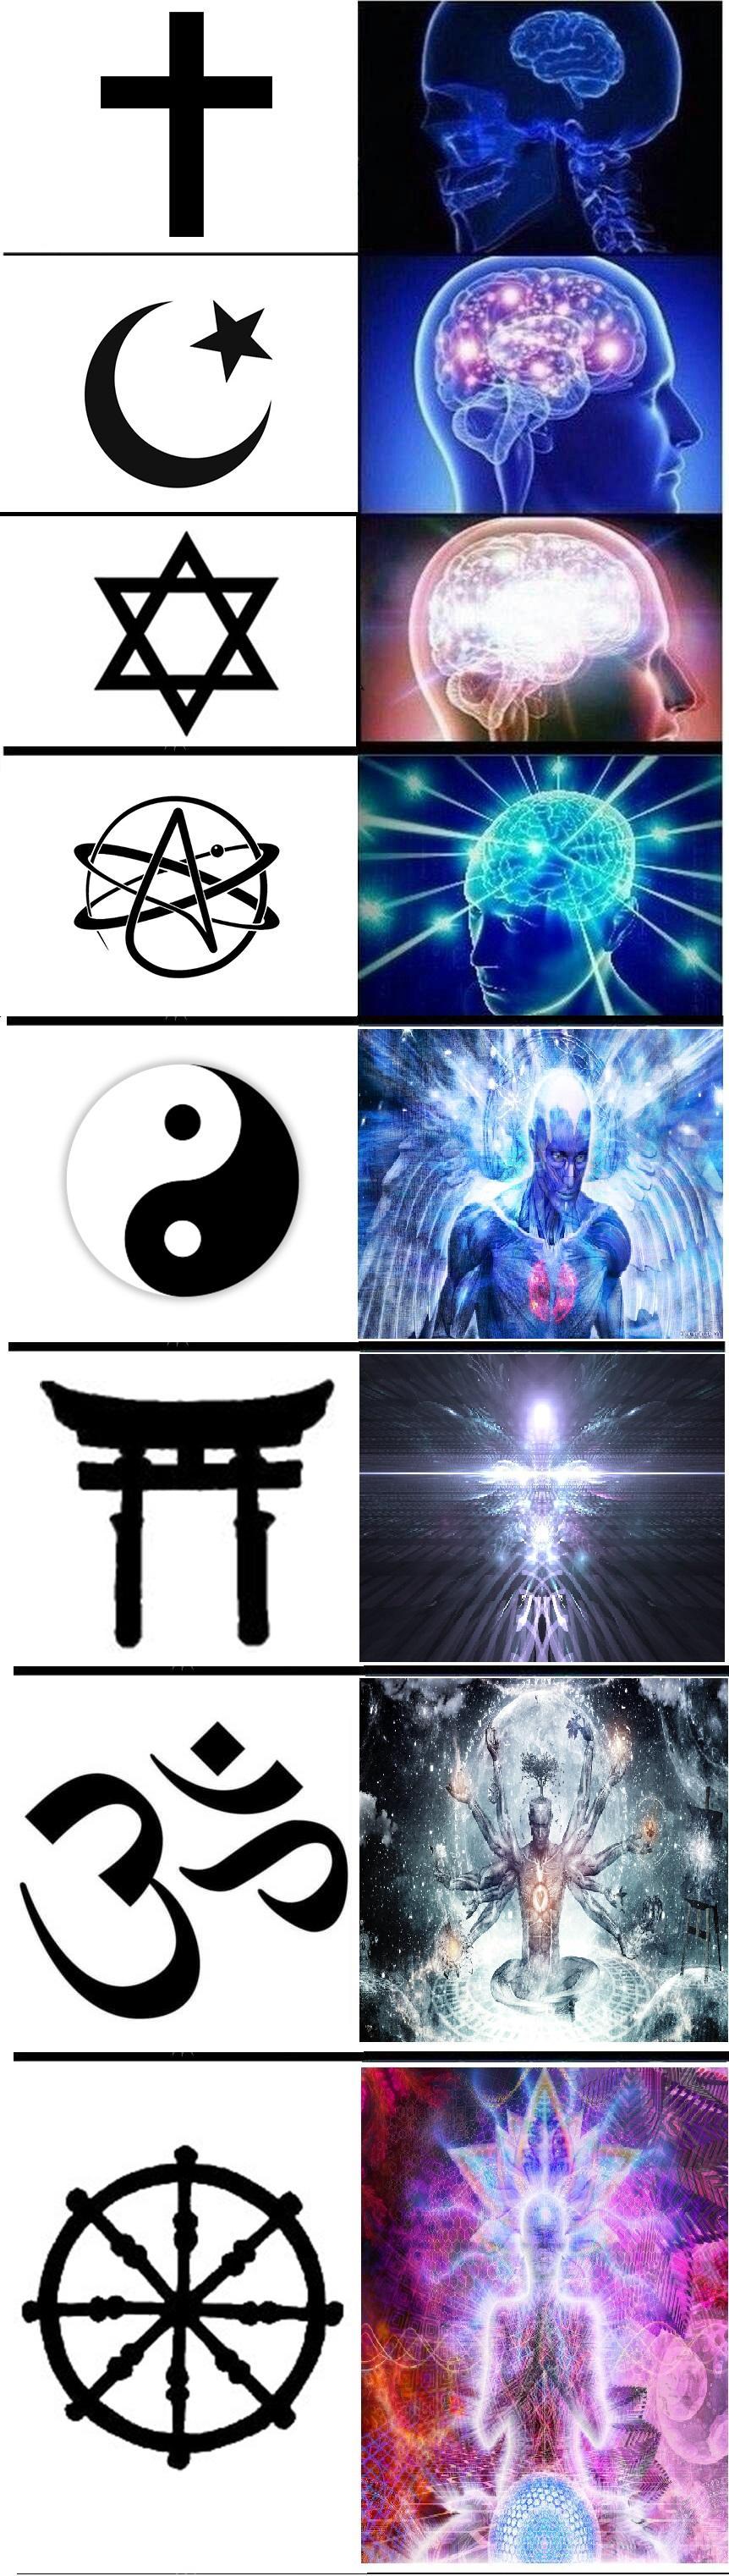 Religions   Galaxy Brain   Brain meme, Memes, Brain images